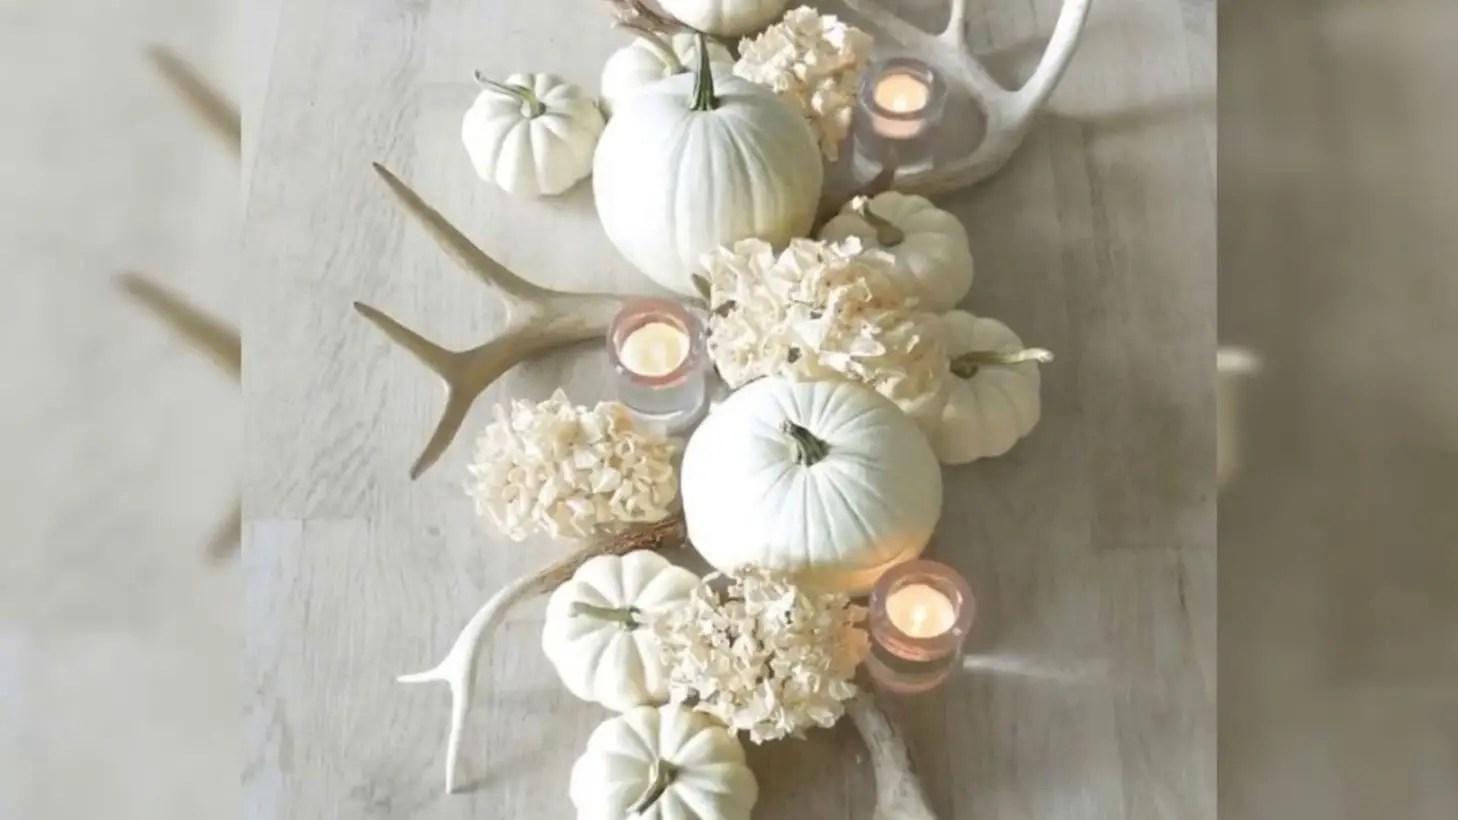 White pumkin and flowers centrepiece